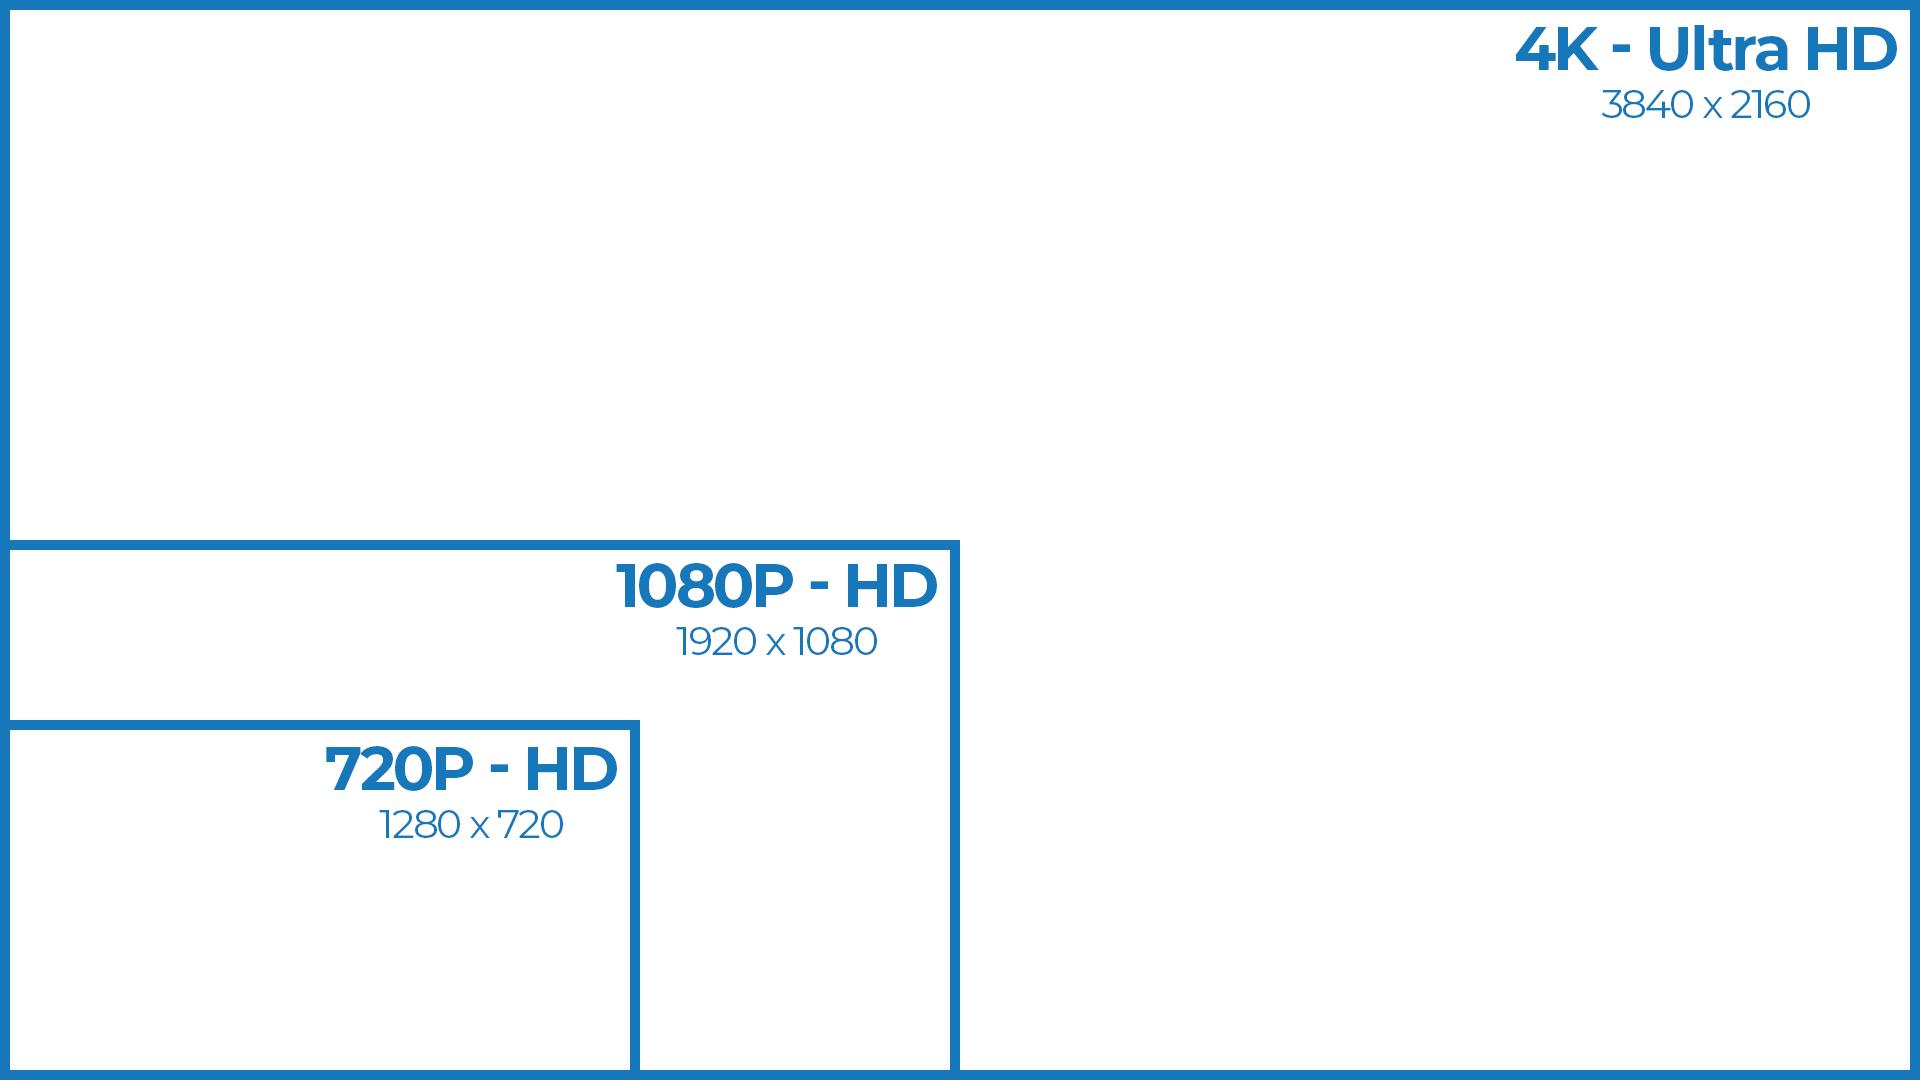 720P vs 1080P vs 4K CCTV Video Resolutions